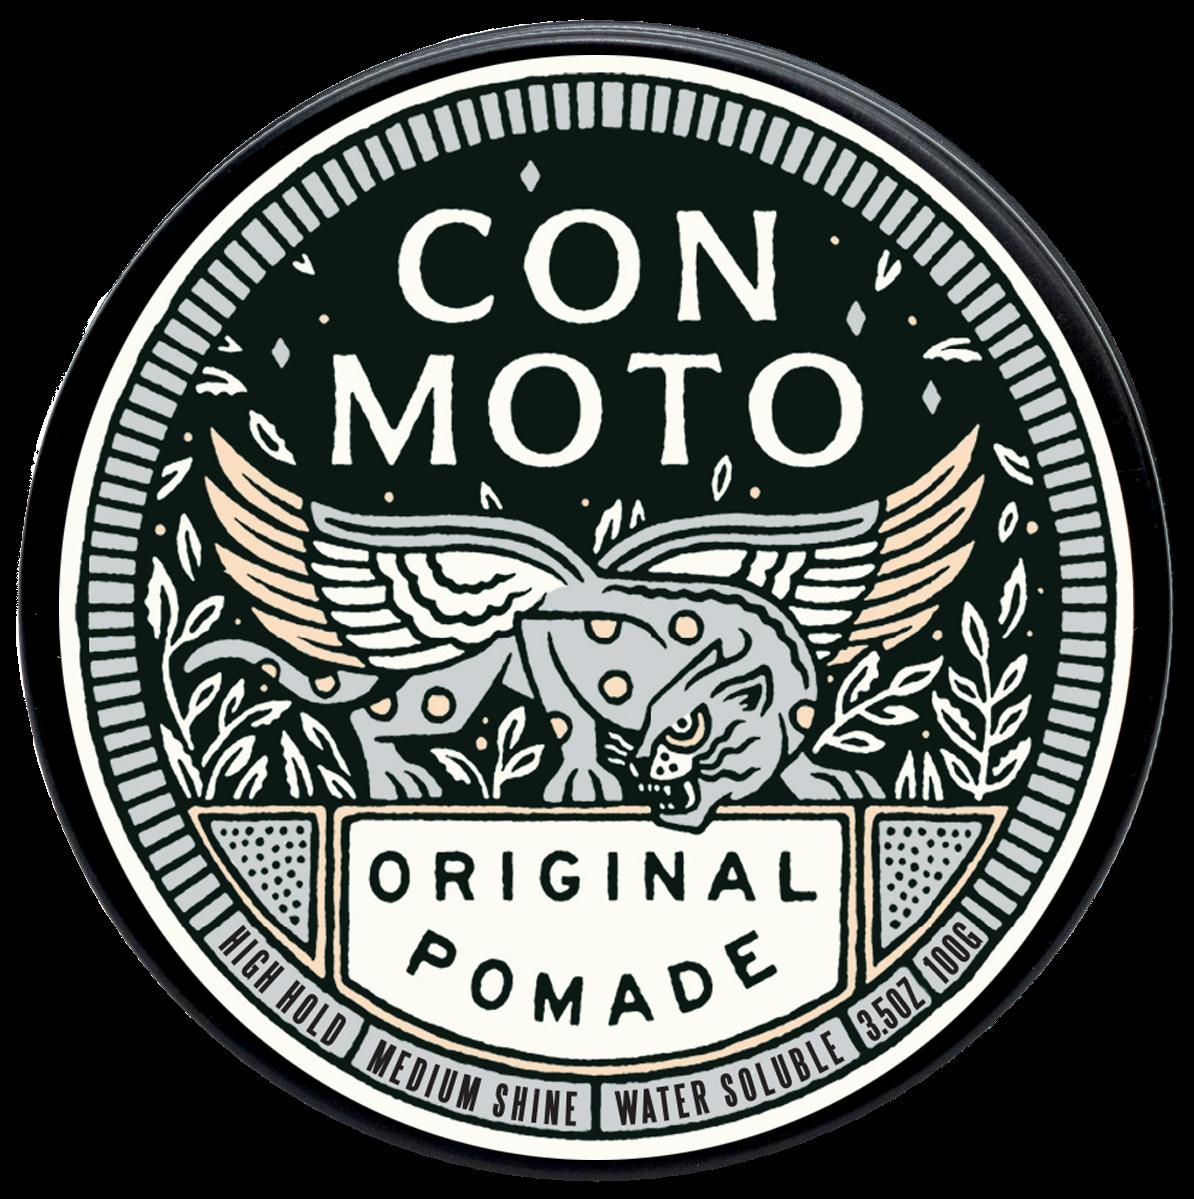 Con_Moto_Original_Front_Black.png